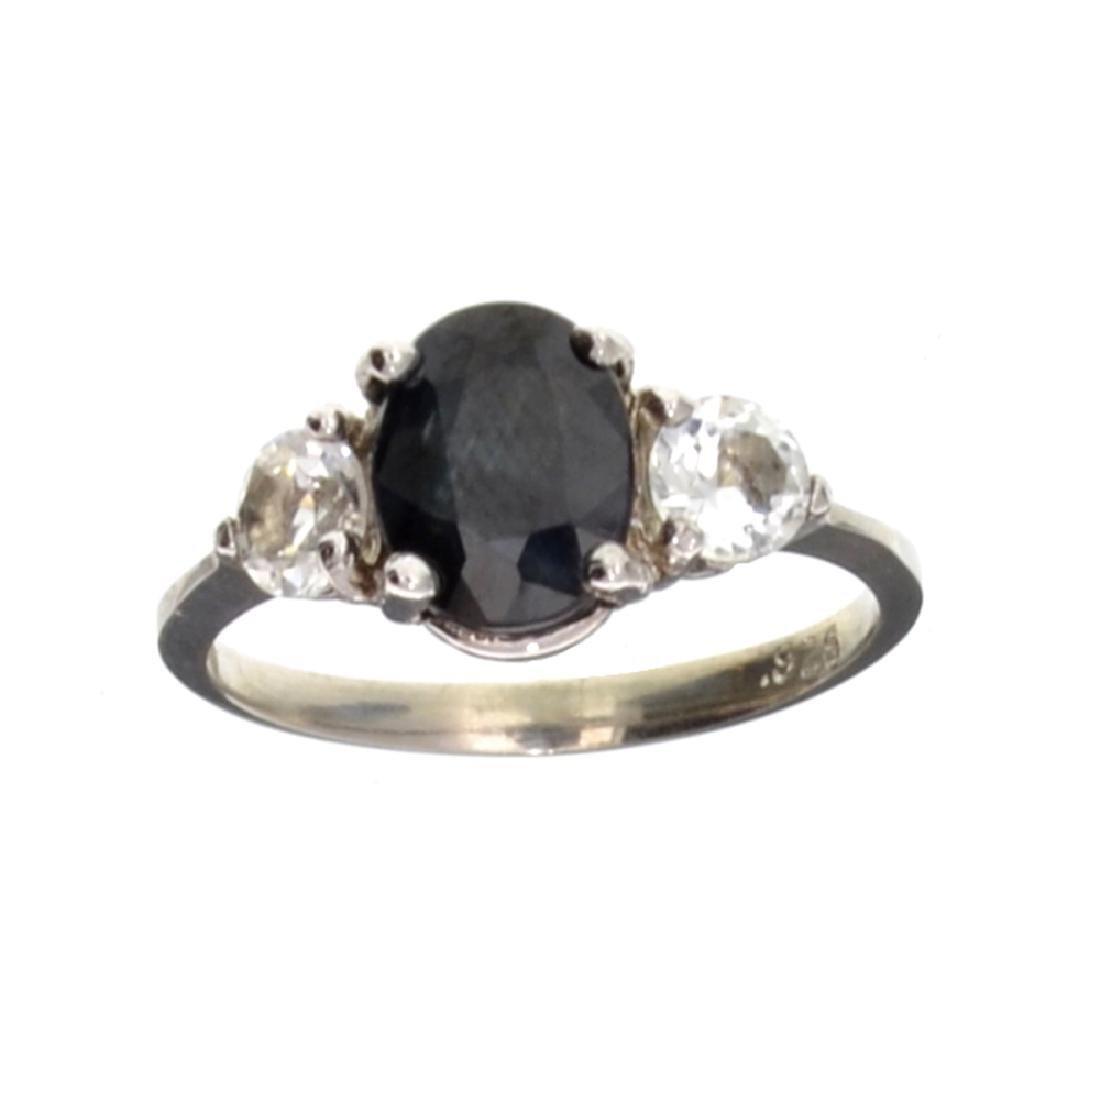 APP: 0.5k Fine Jewelry Designer Sebastian 2.12CT